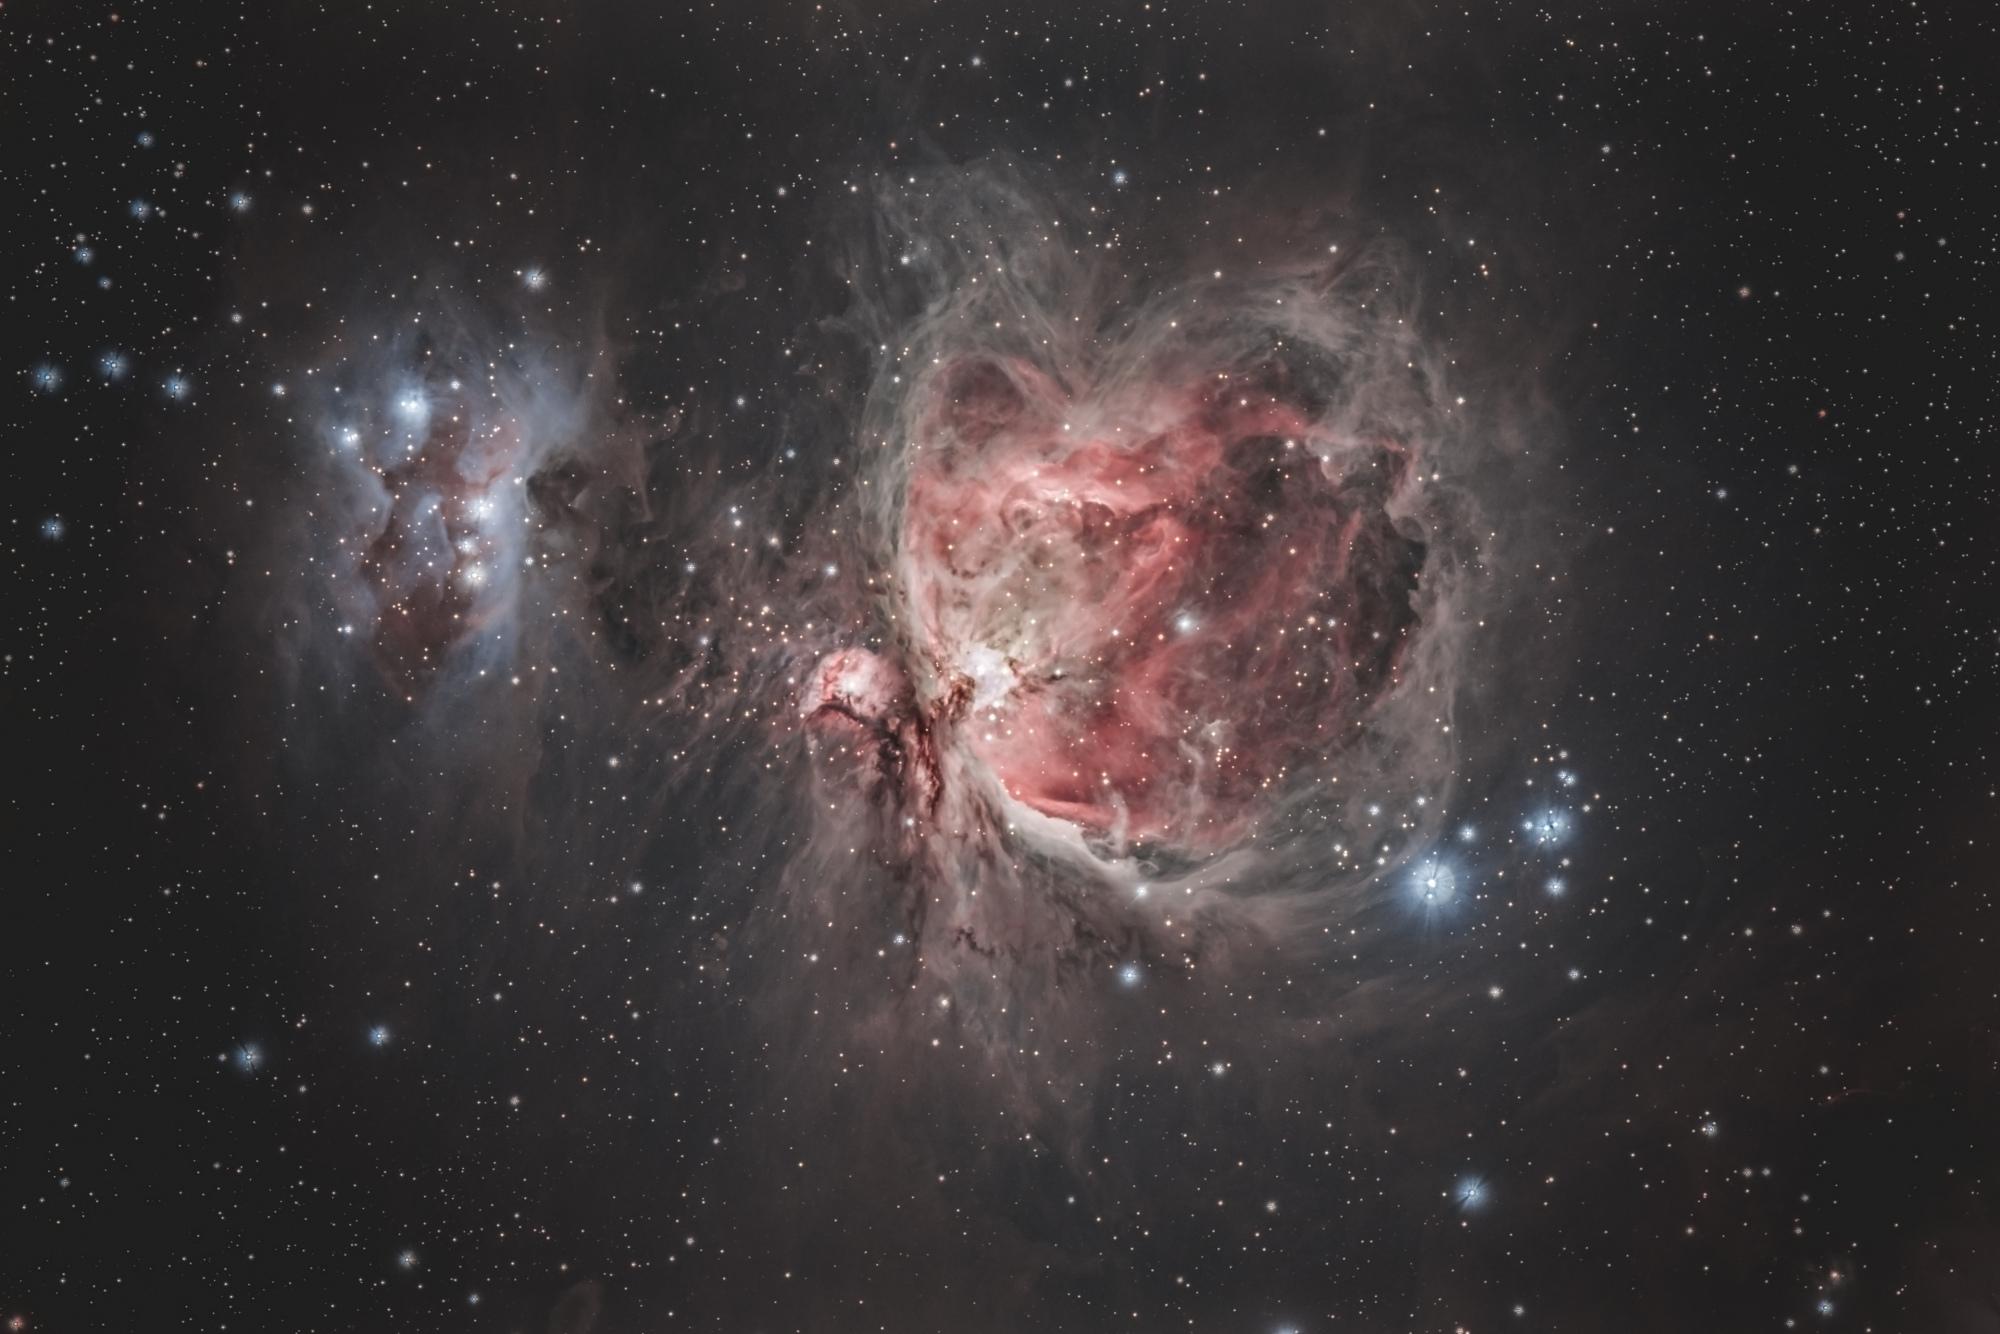 M42-3840-.thumb.jpg.29b233c252bc34b30e92e8c408256100.jpg